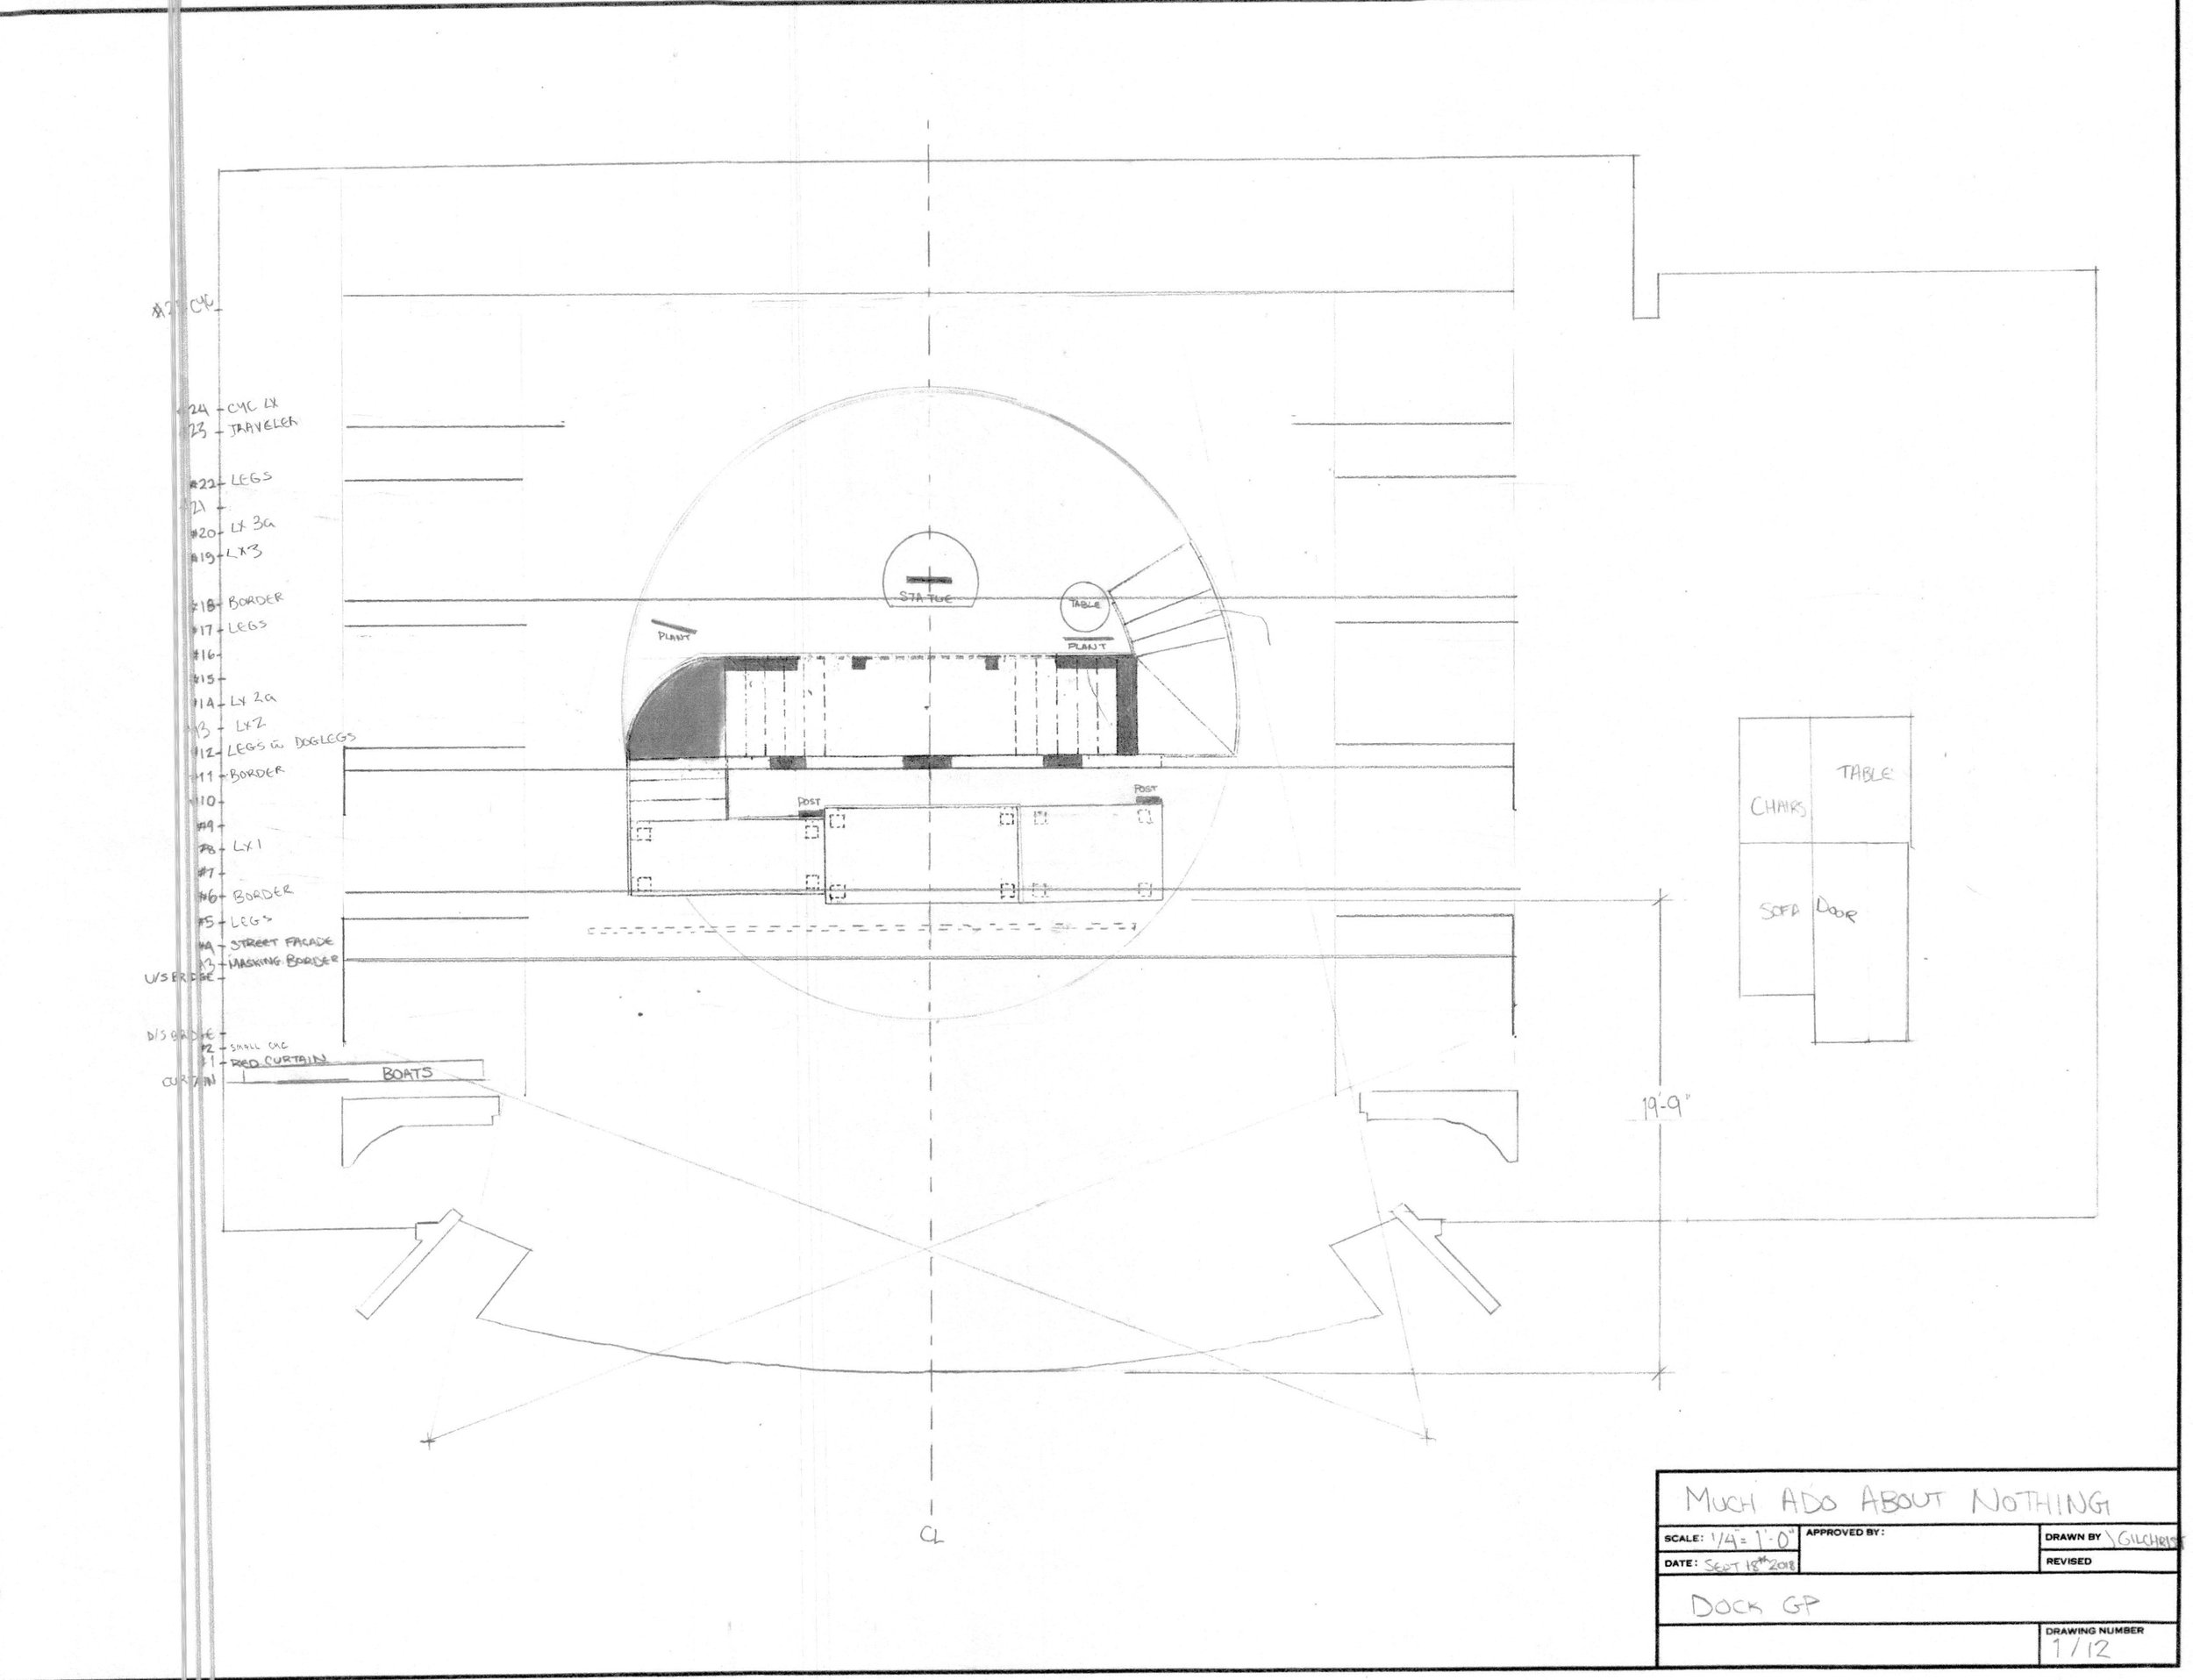 01 Dock Ground Plan M-page-001.jpg